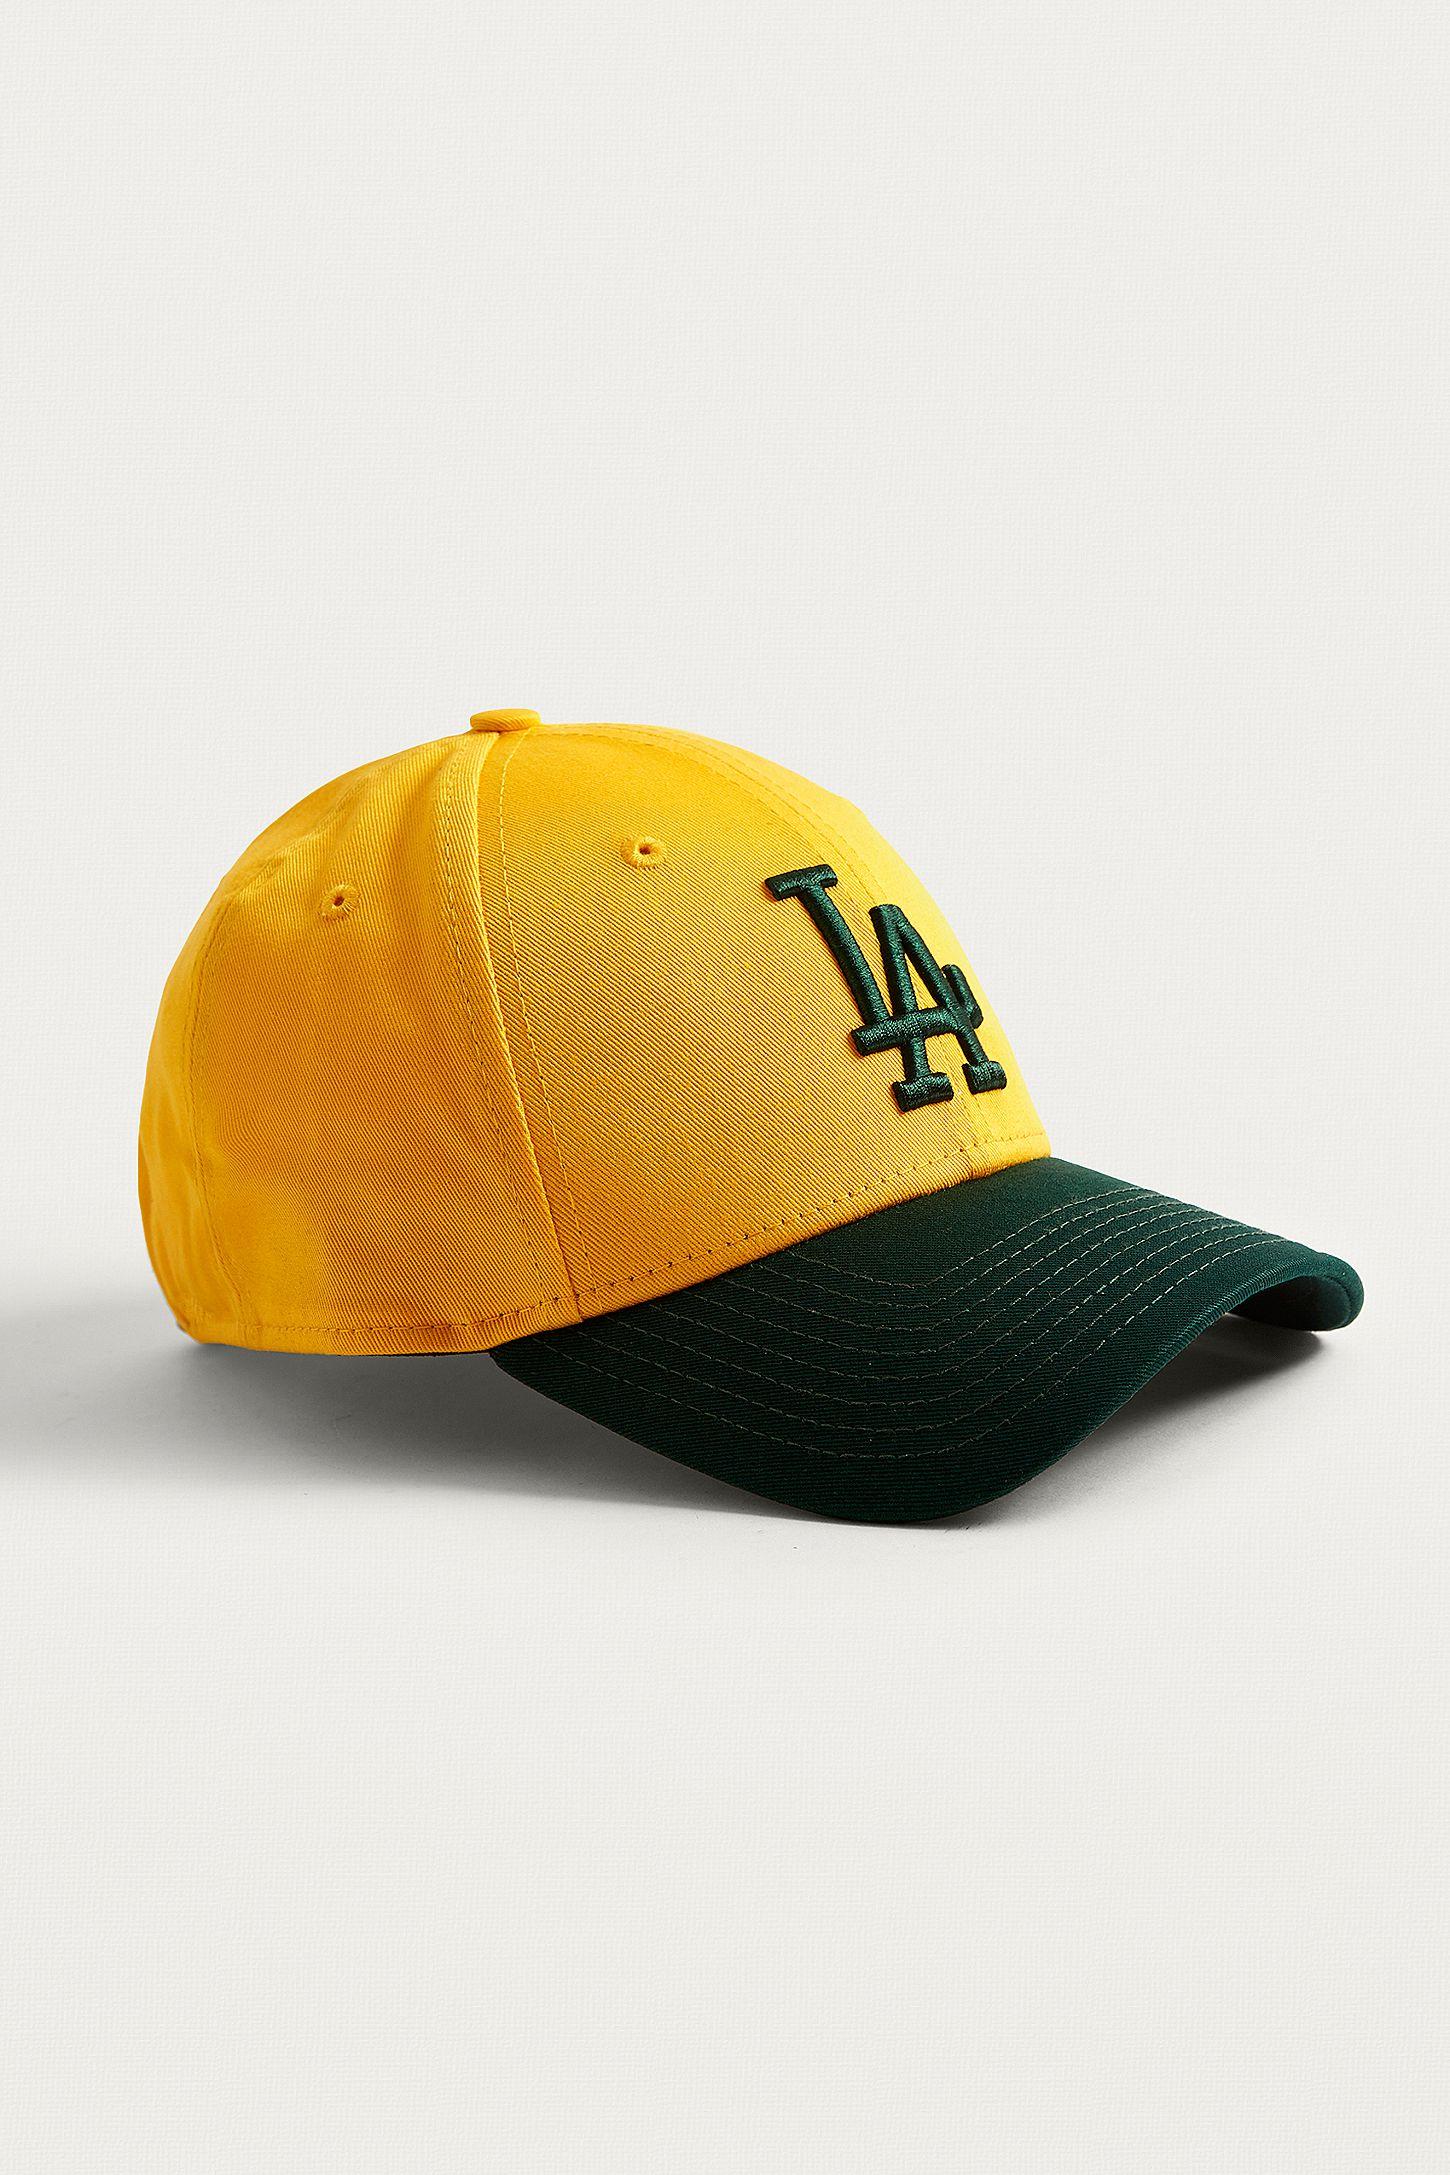 New Era 9 FORTY LA Dodgers Yellow and Green Cap  aec3349572b